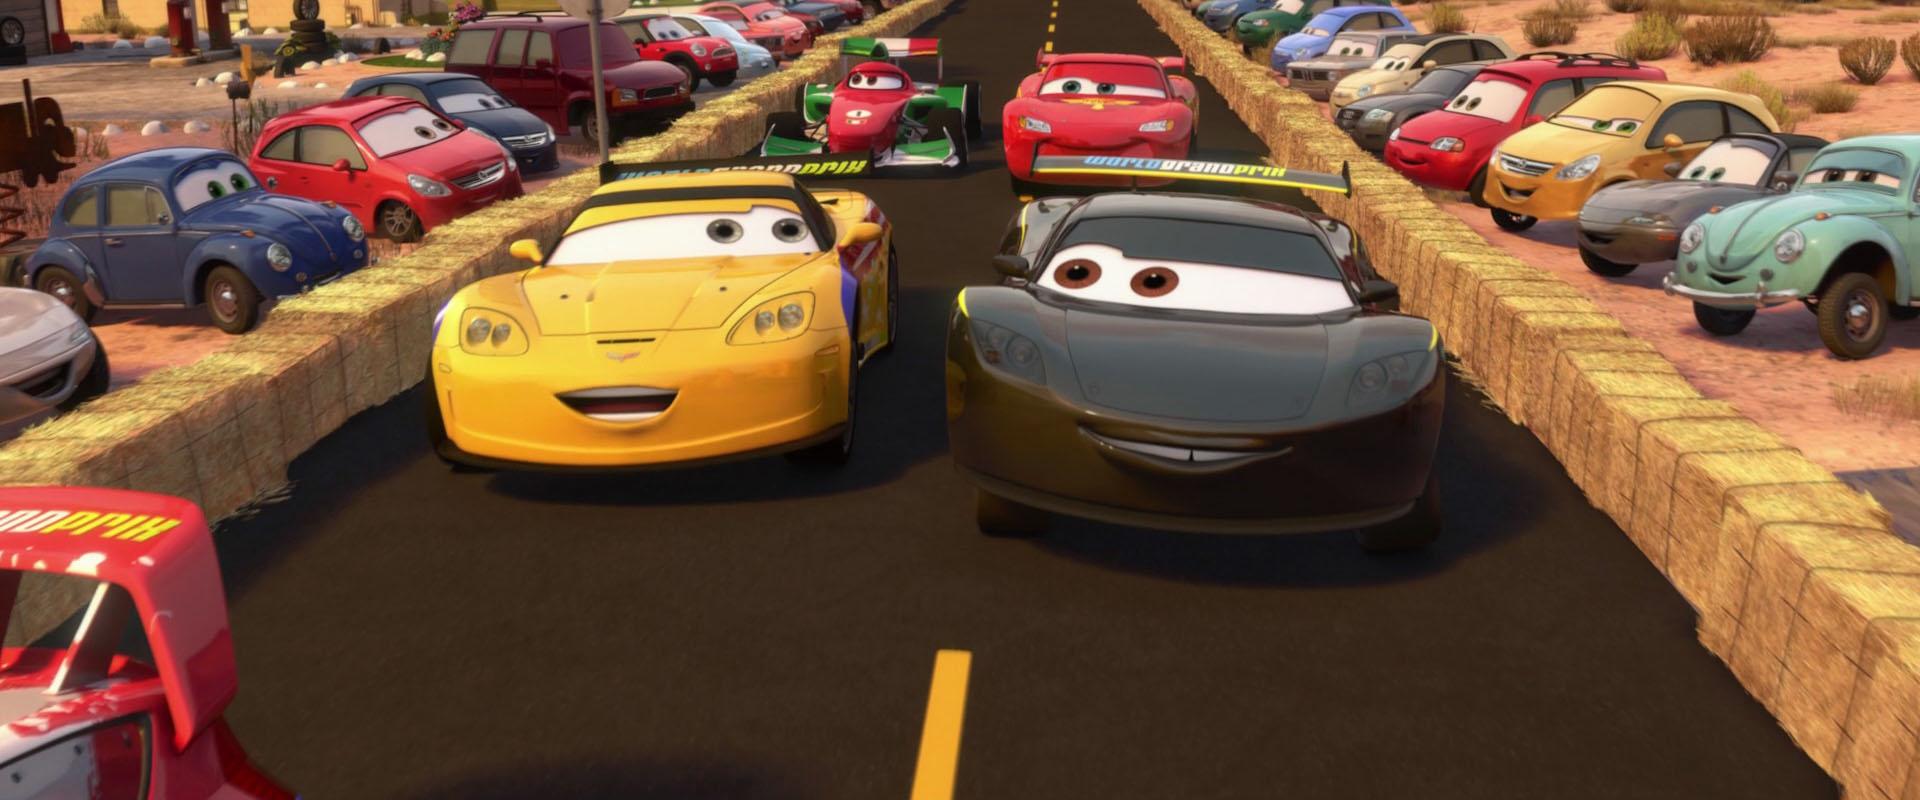 lewis-hamilton-personnage-cars-2-02